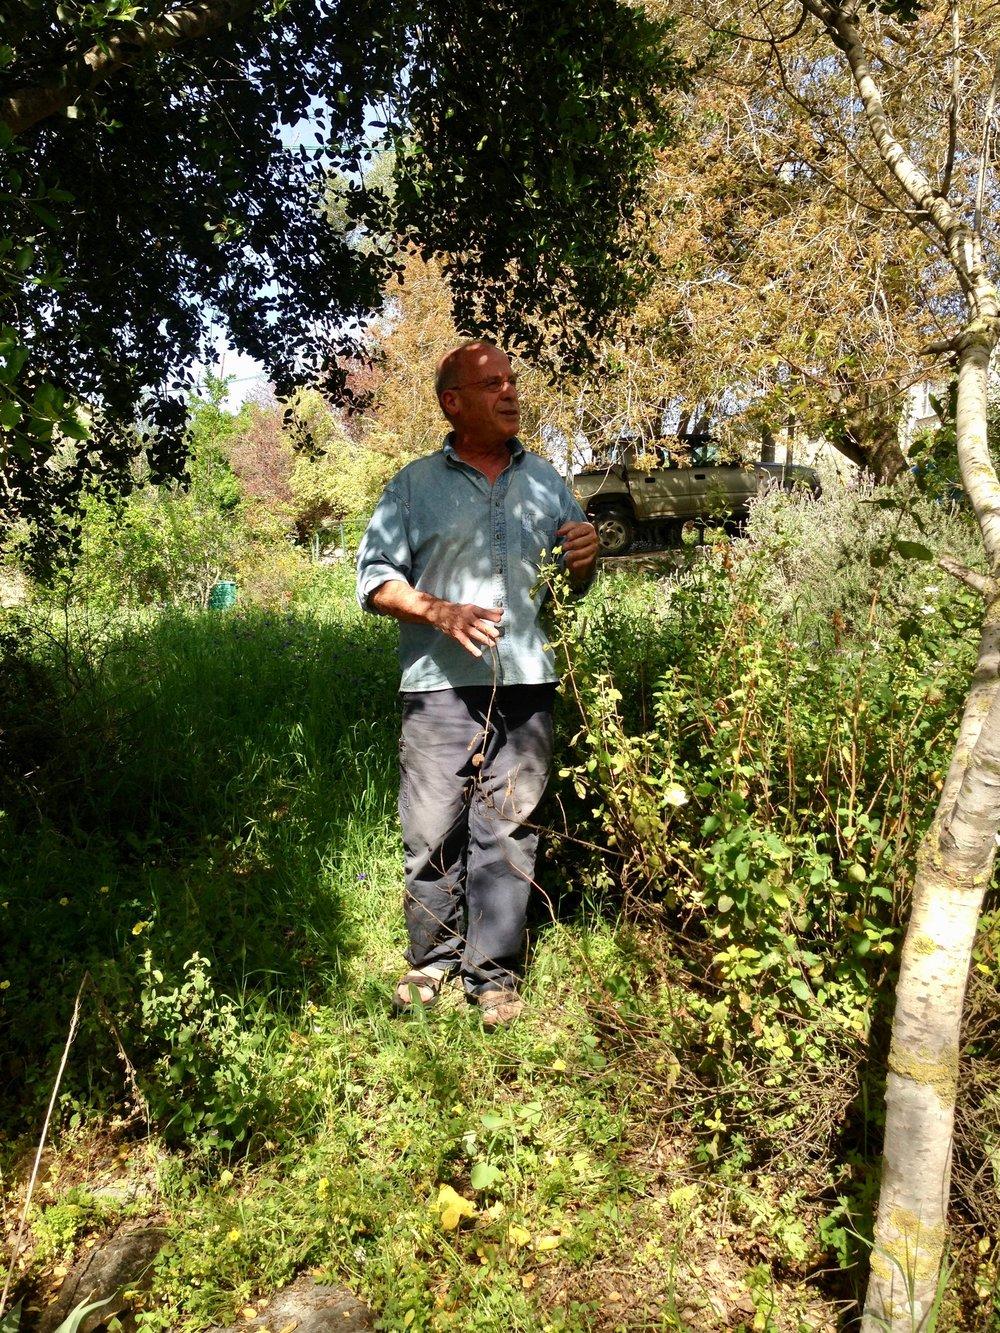 Israeli author Meir Shalev in his garden